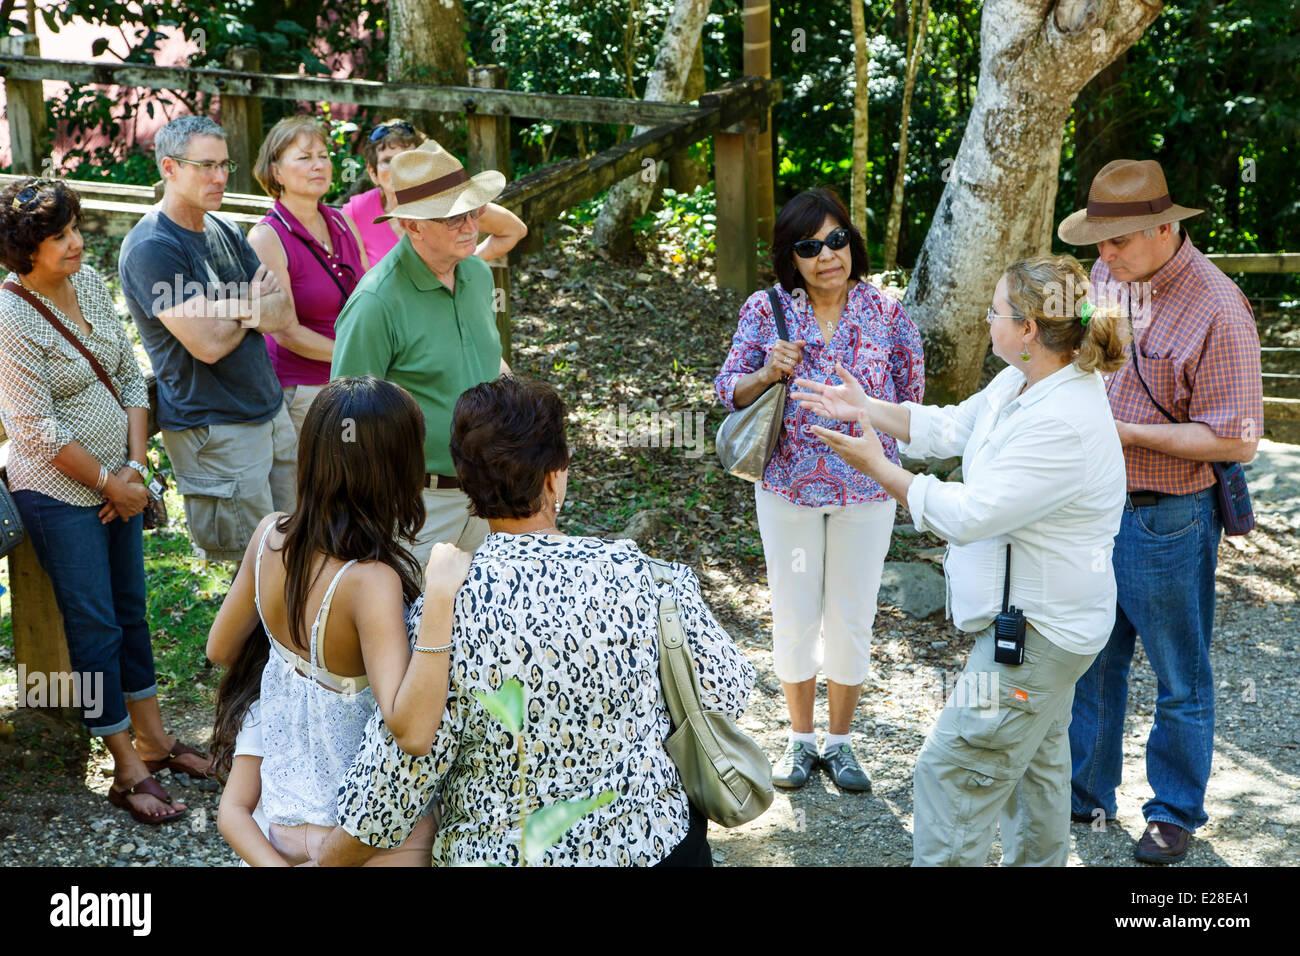 Interpretive guide and visitors group, Hacienda Buena Vista, near Ponce, Puerto Rico - Stock Image